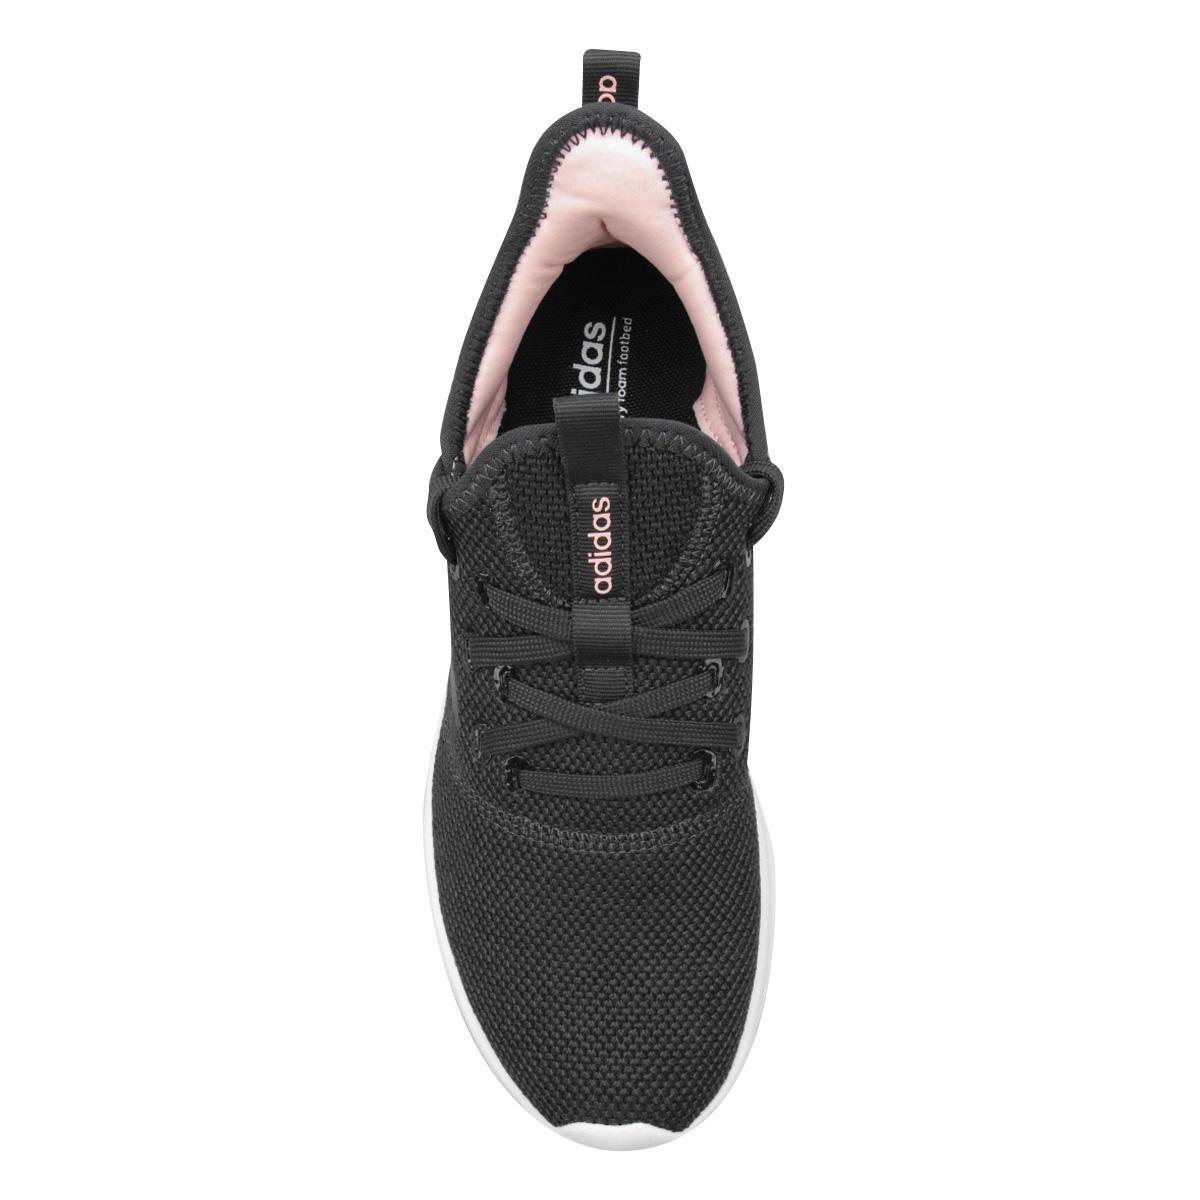 adidas cloudfoam pure feminino skate shoes e14be 2b90d - wartakata.com 77d8e4e1e7fba